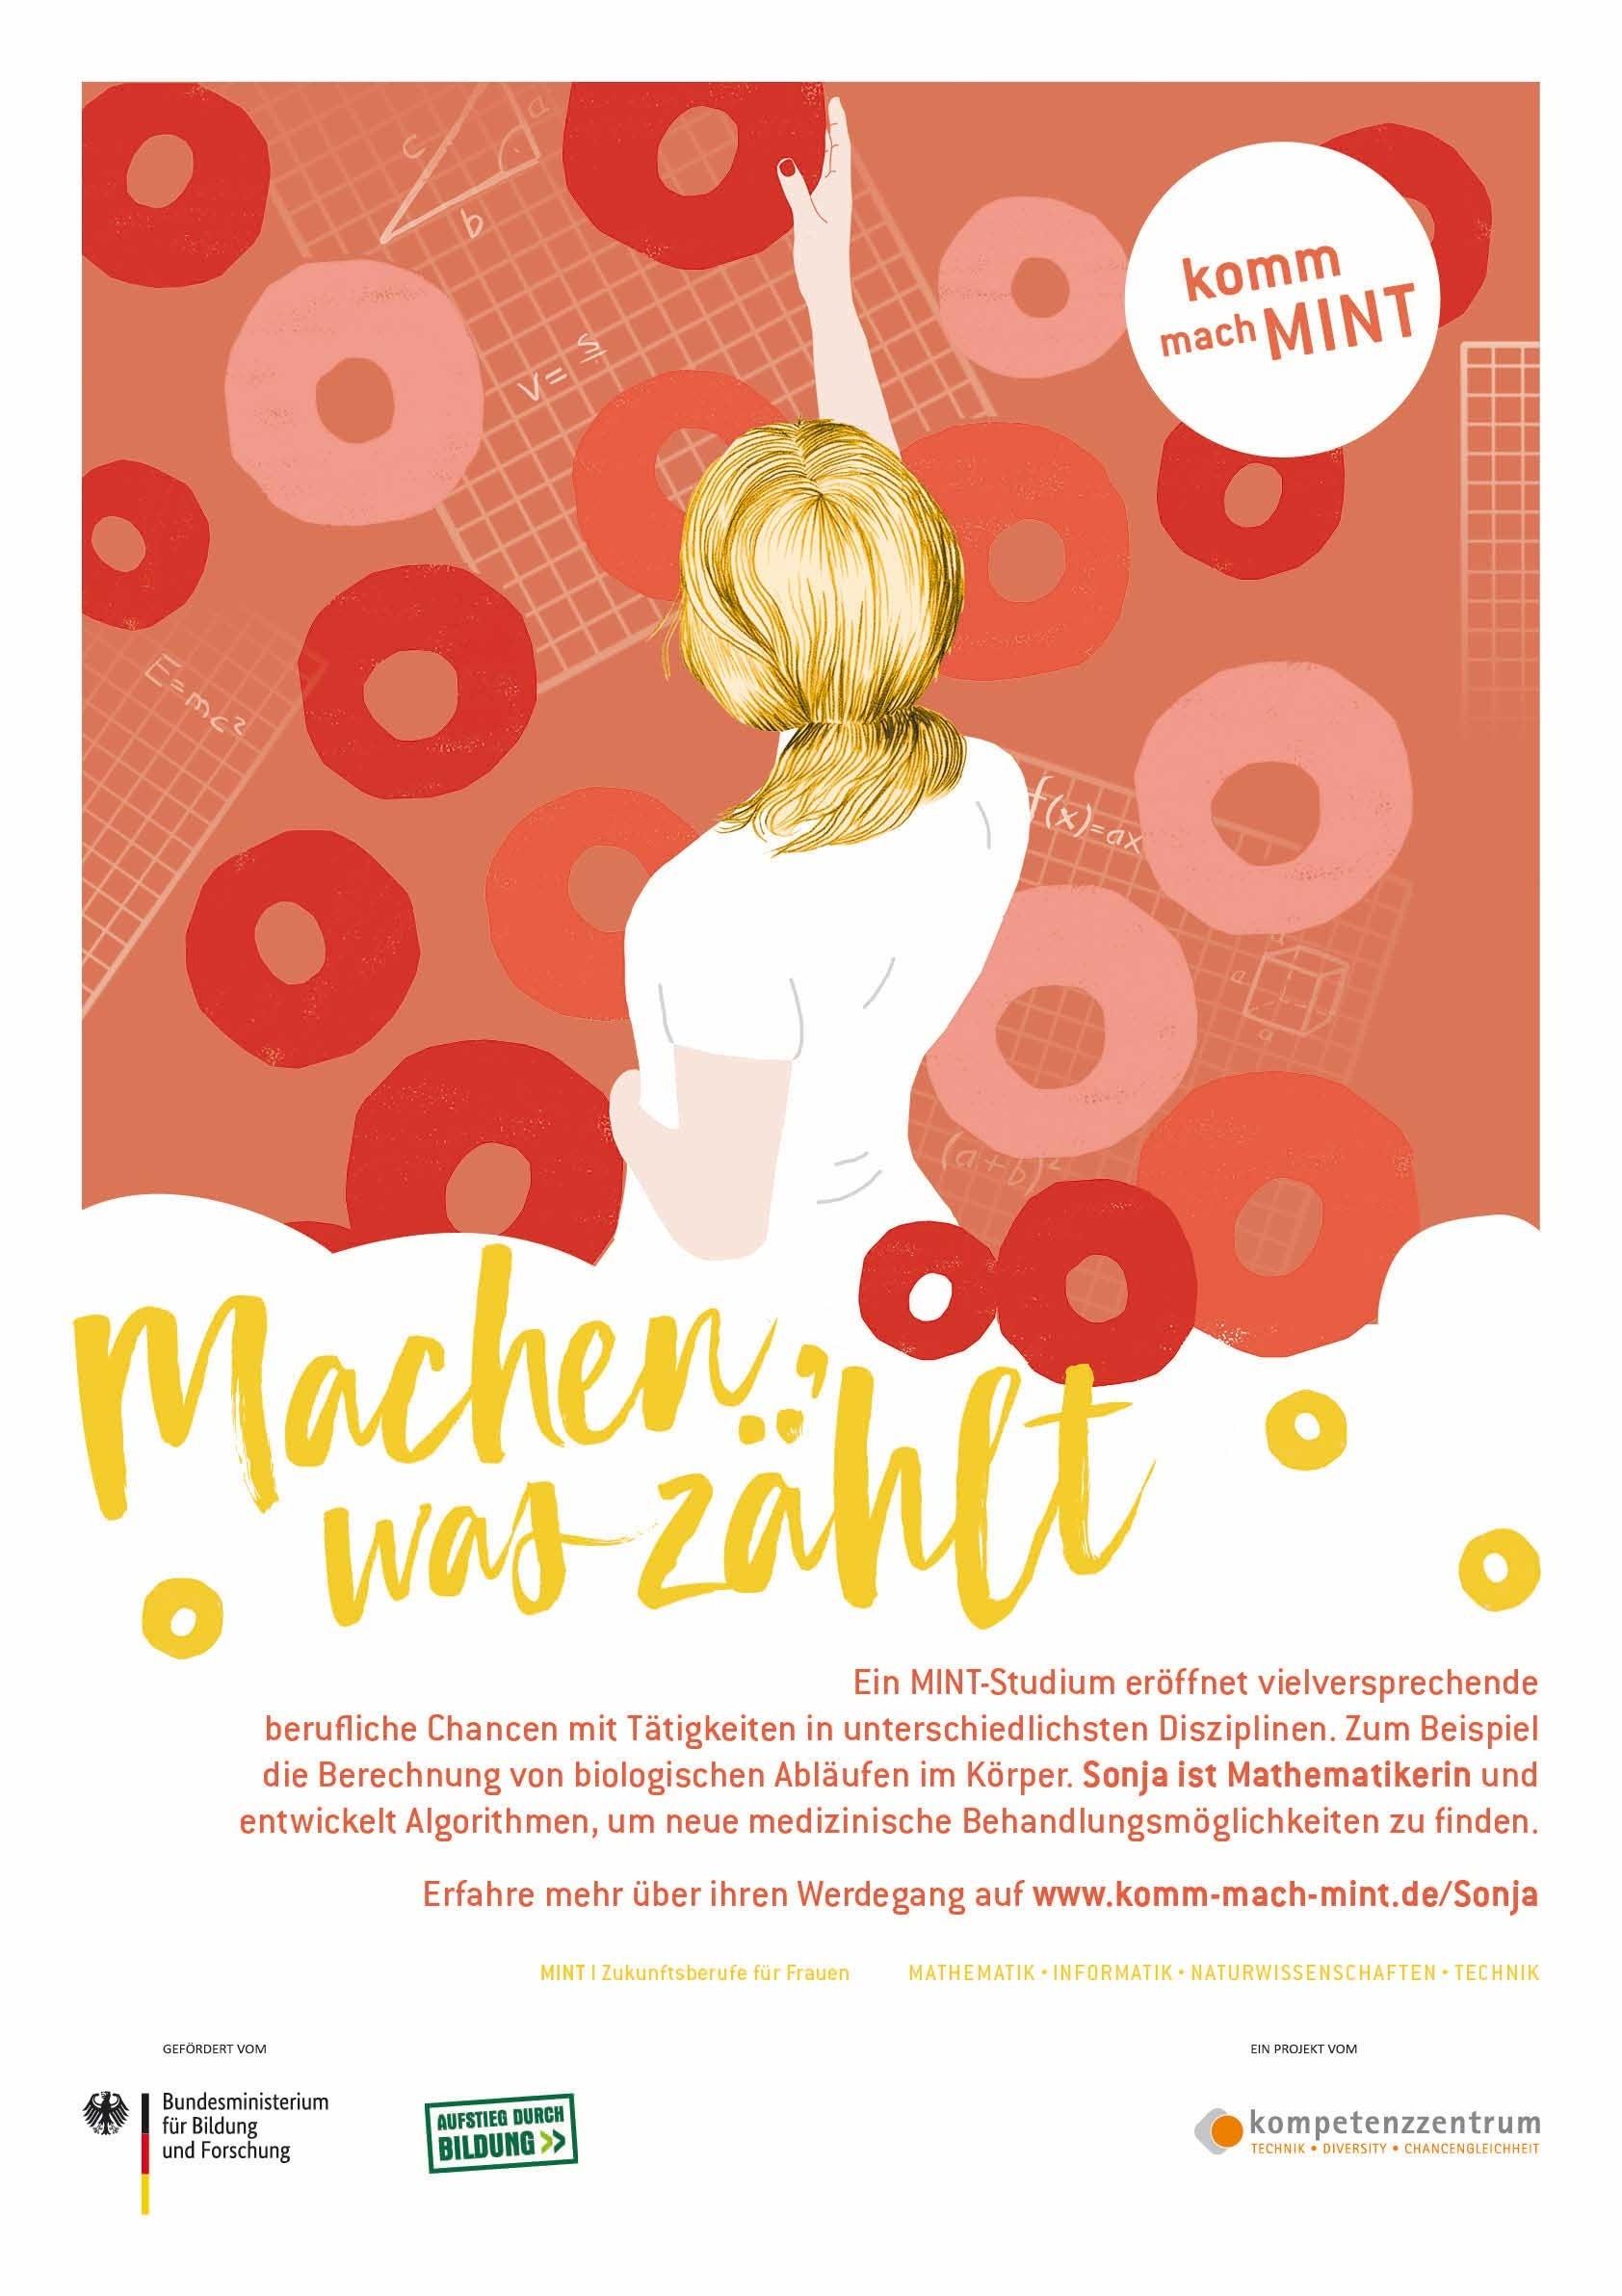 Machen, was zählt - Mathematik Poster | A 1